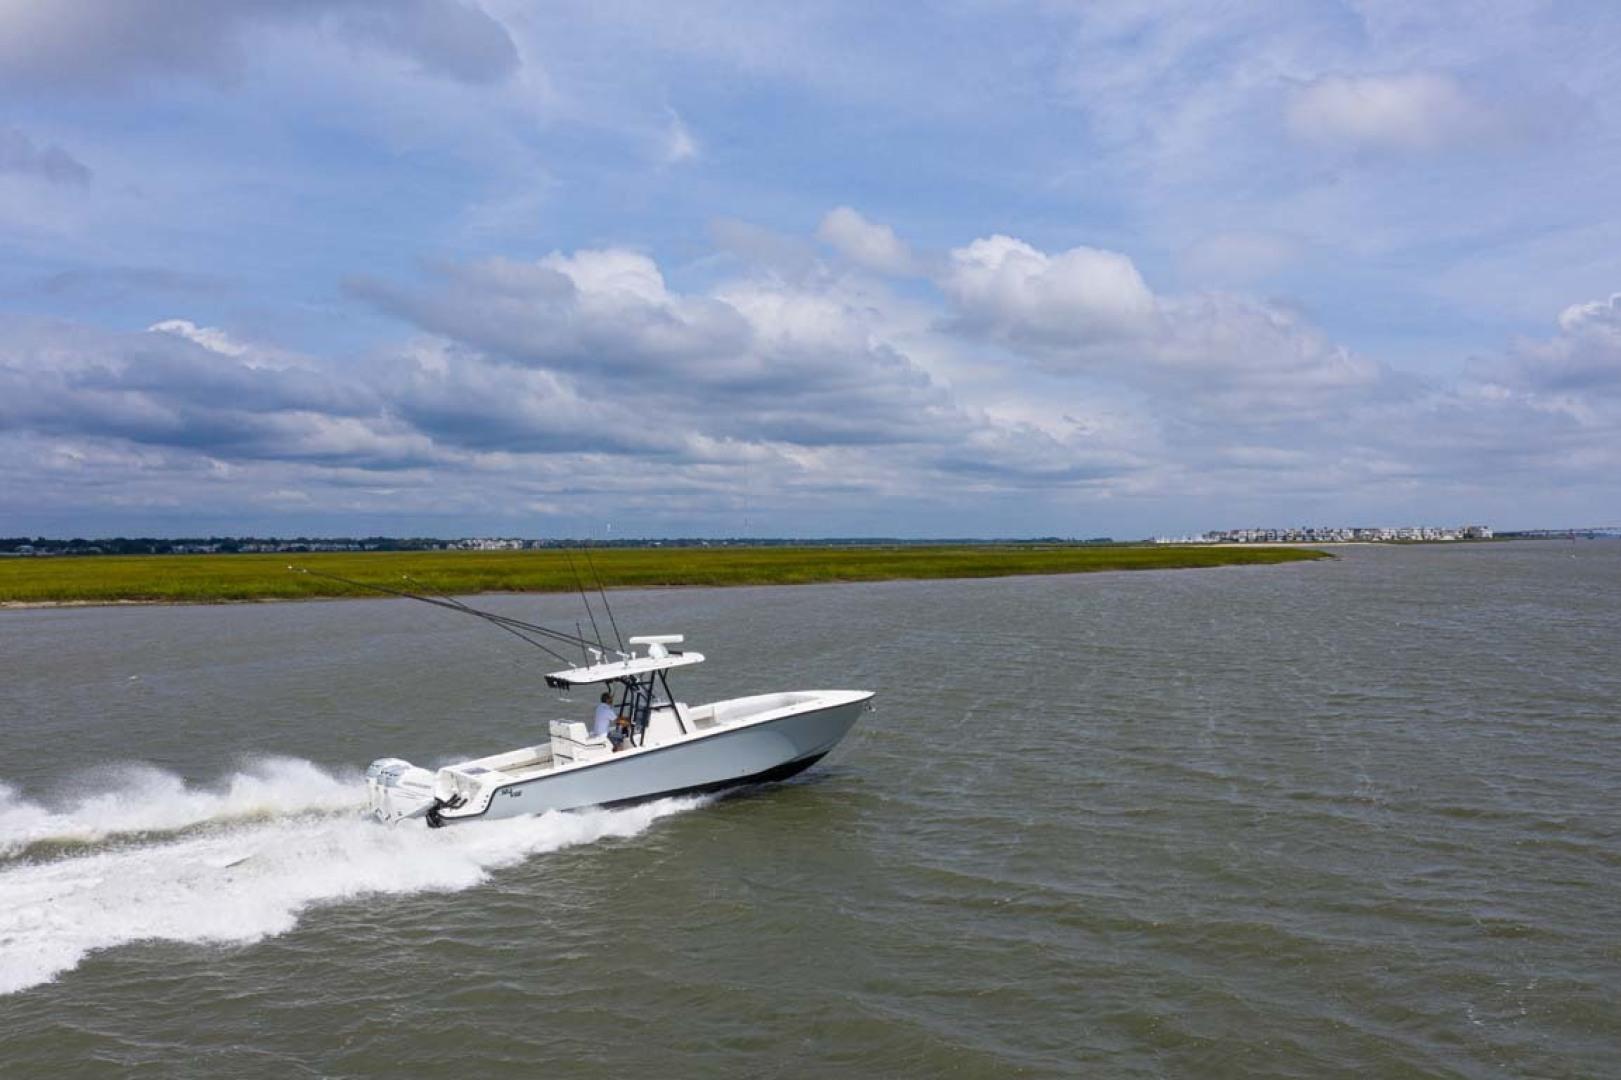 SeaVee-340 B Center Console 2014-Riff Raff Mount Pleasant-South Carolina-United States Running-1509754 | Thumbnail